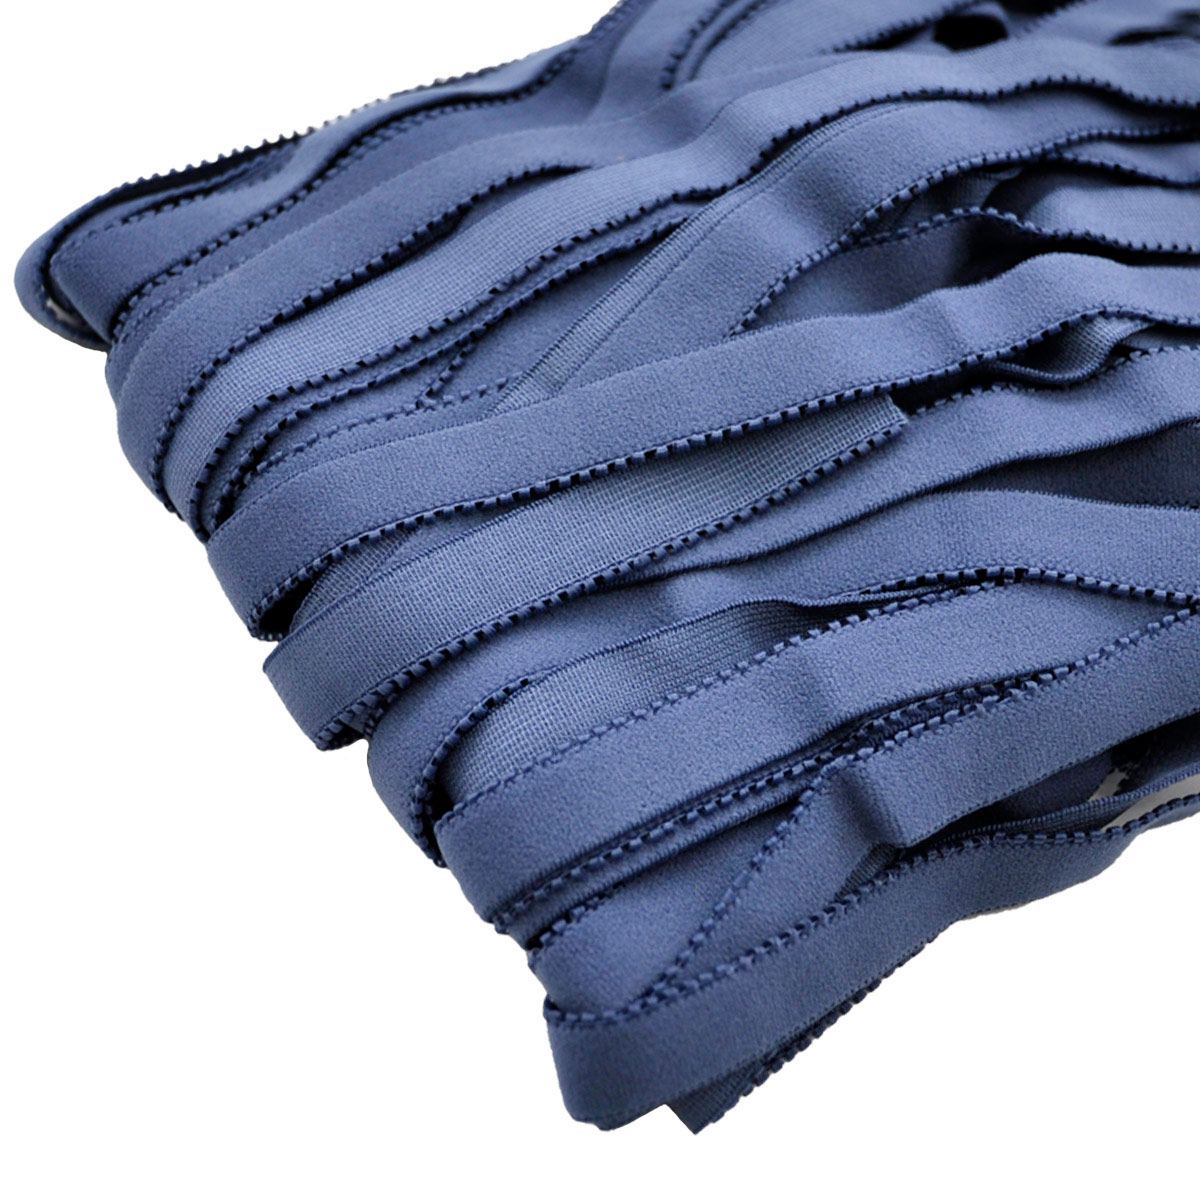 STD/29 эластичная отделочная лента 14мм*25м, сине-серый